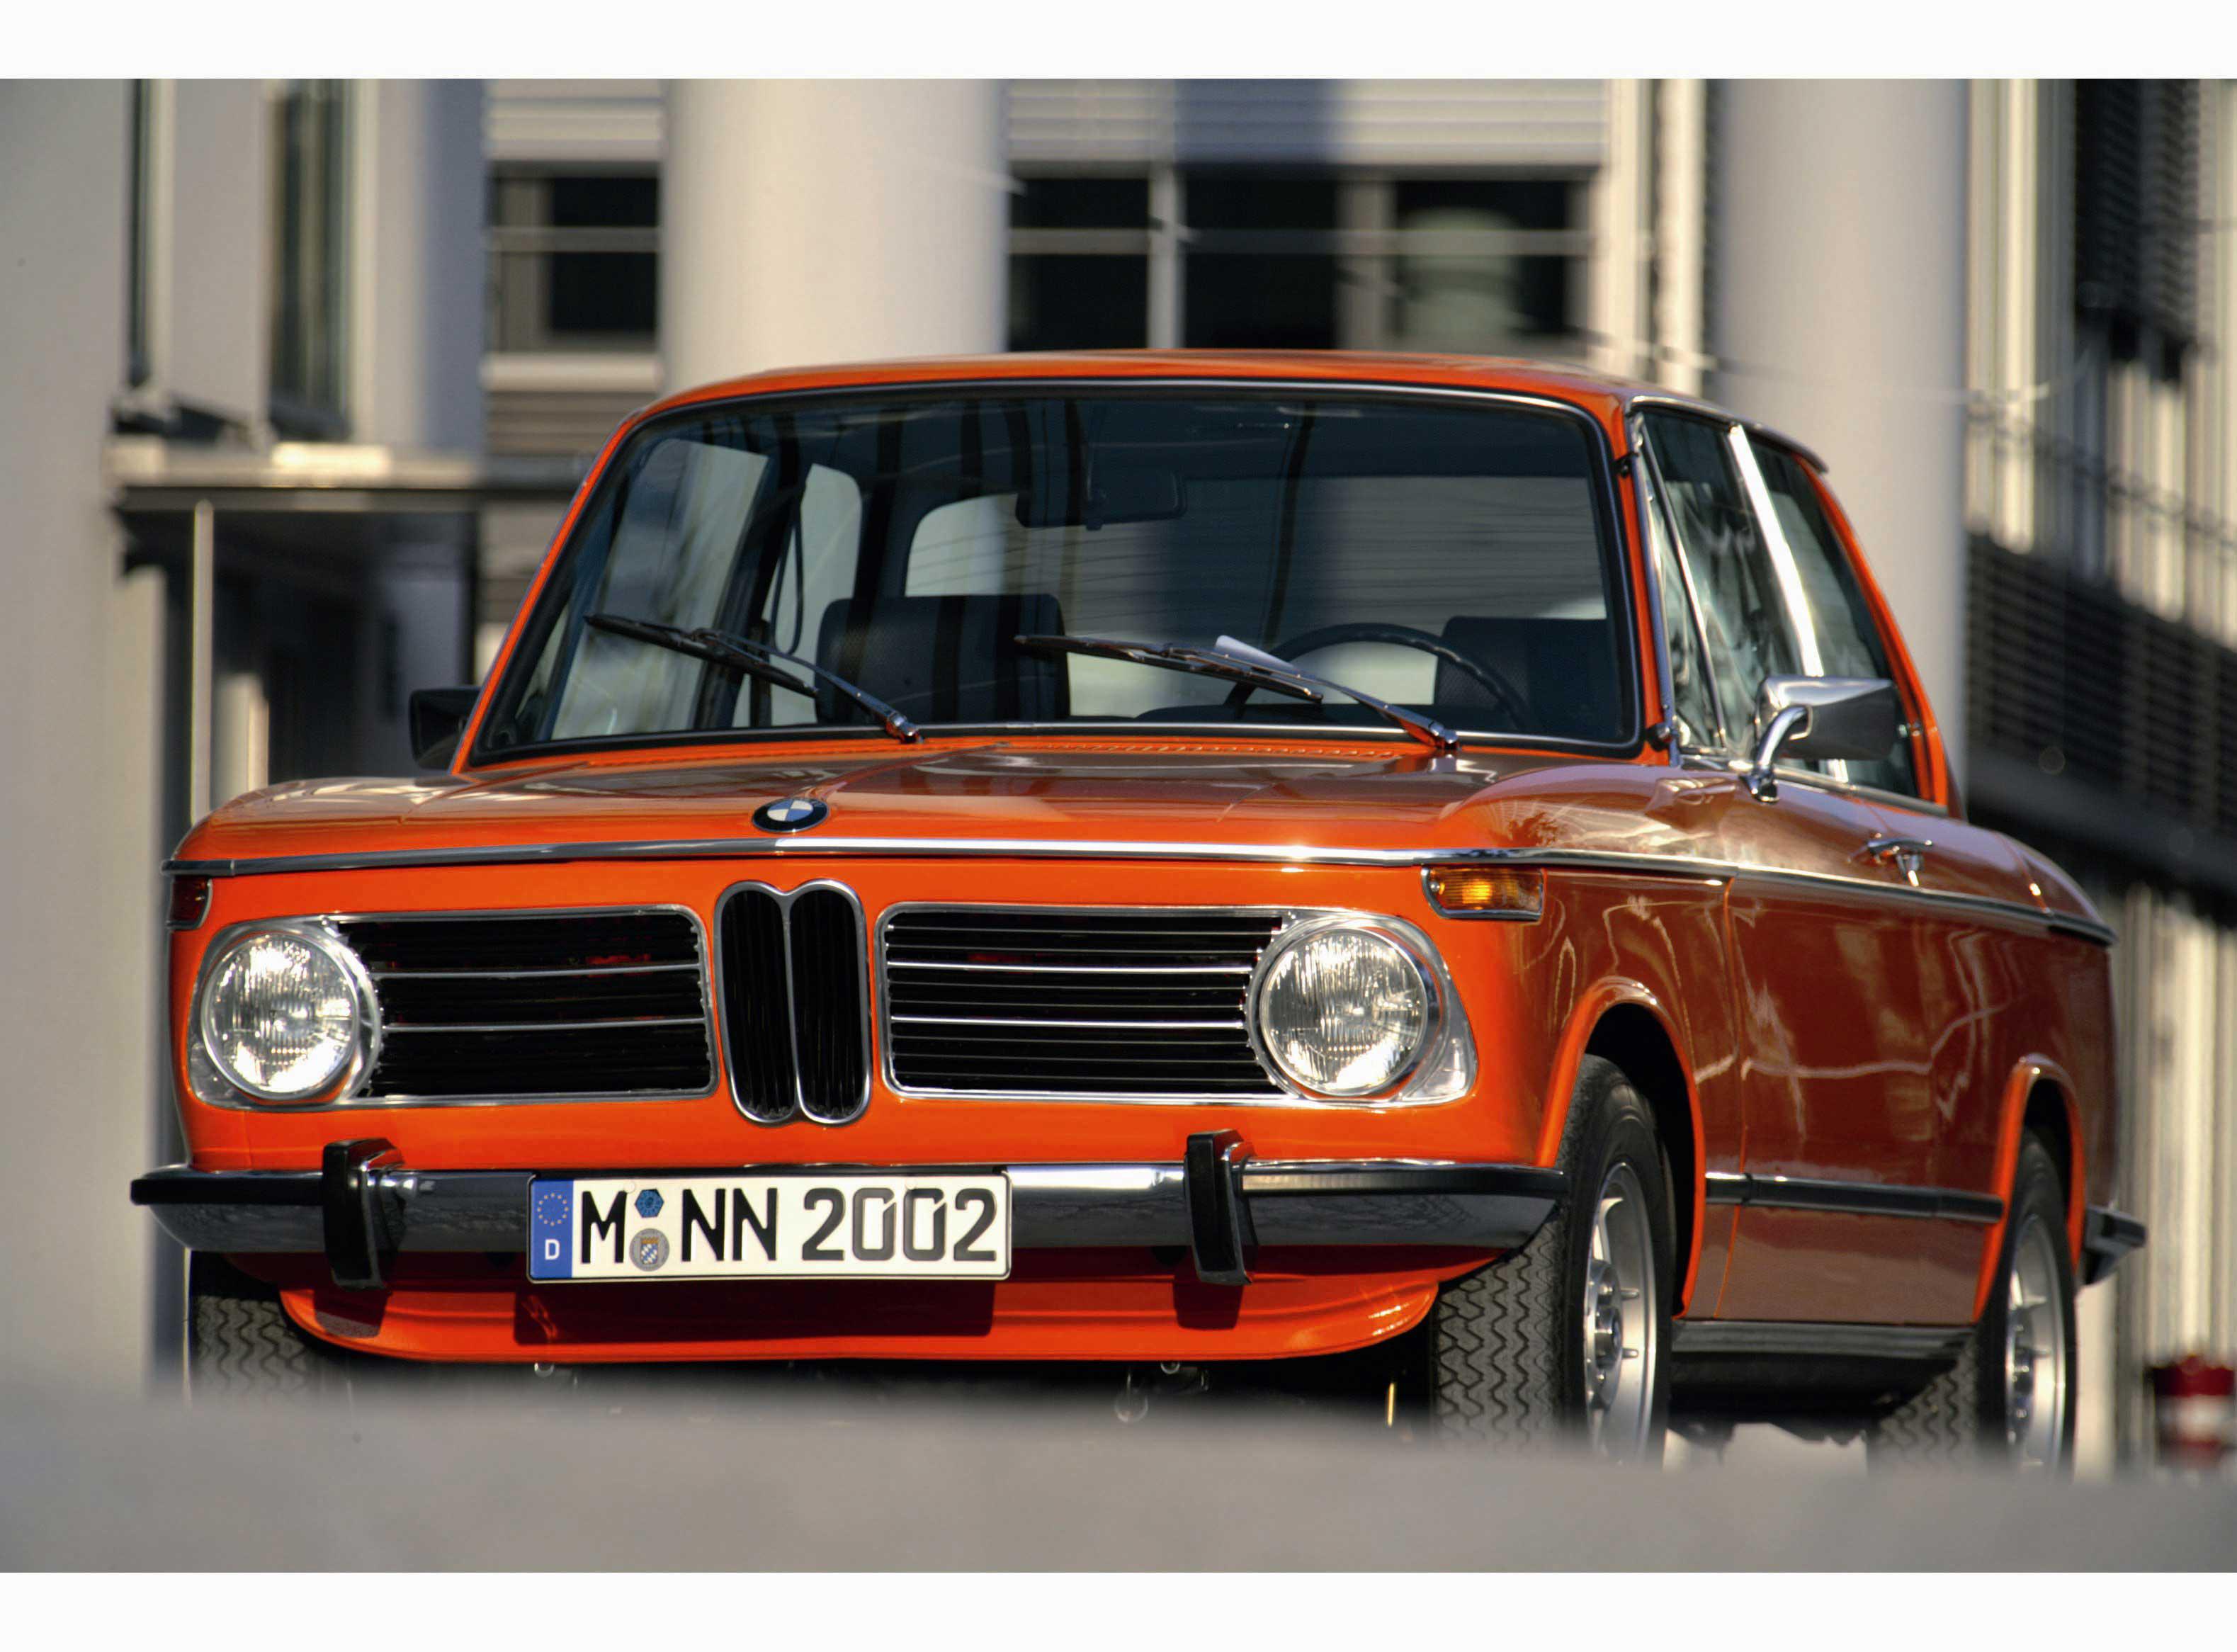 BMW 2002 - The First Sport Sedan